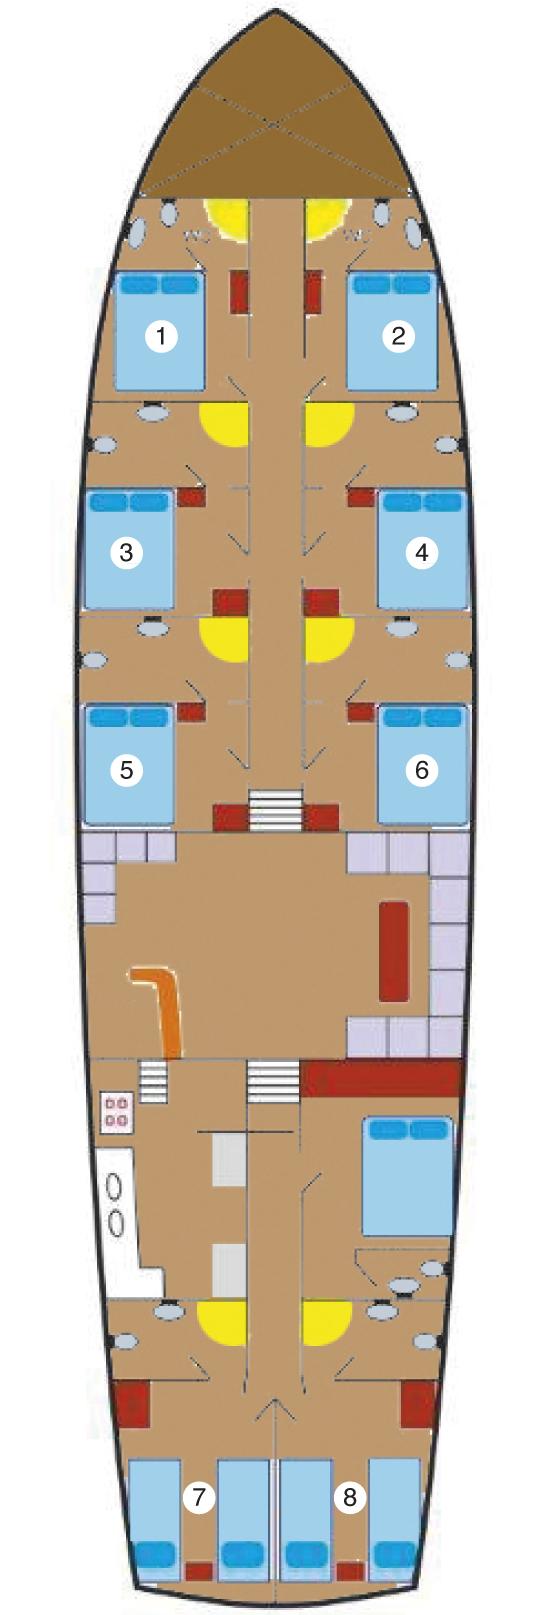 Perla-Del-Mar-I-layout.jpg